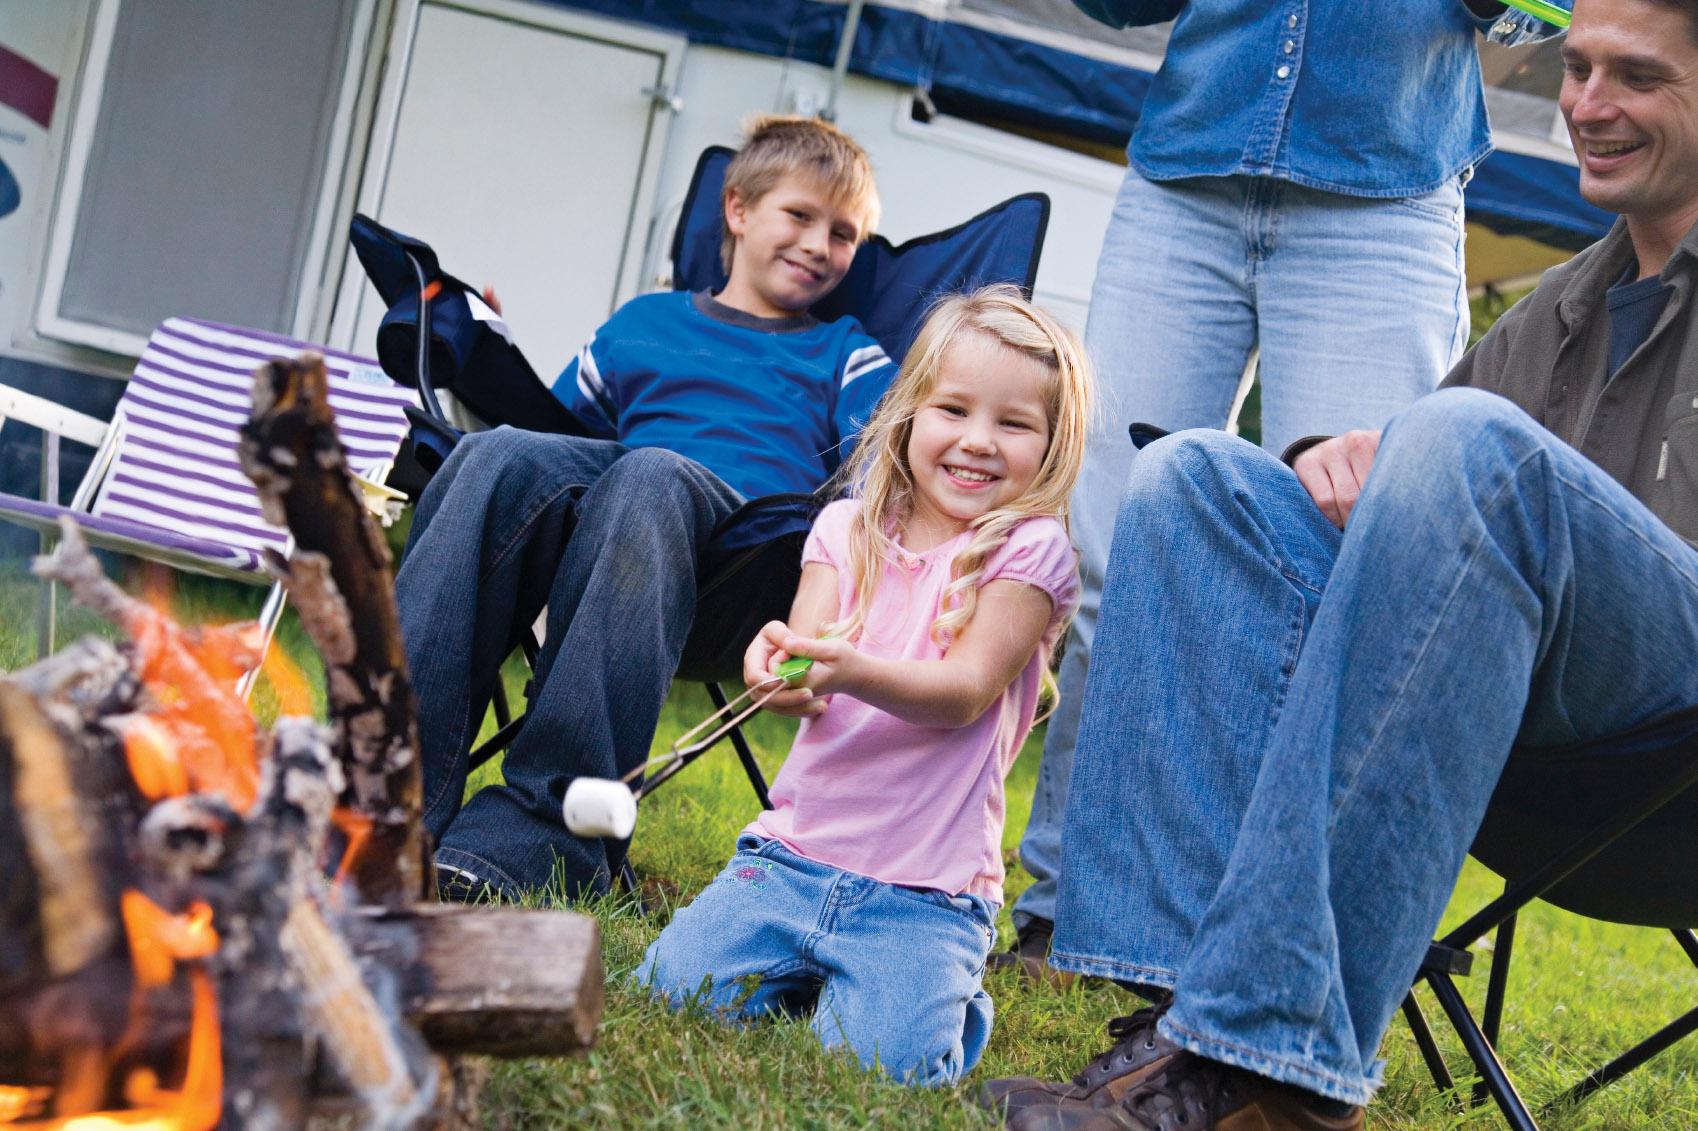 Toasting Marshmallows At The Lantern Resort Campground & Motel - Jefferson, NH